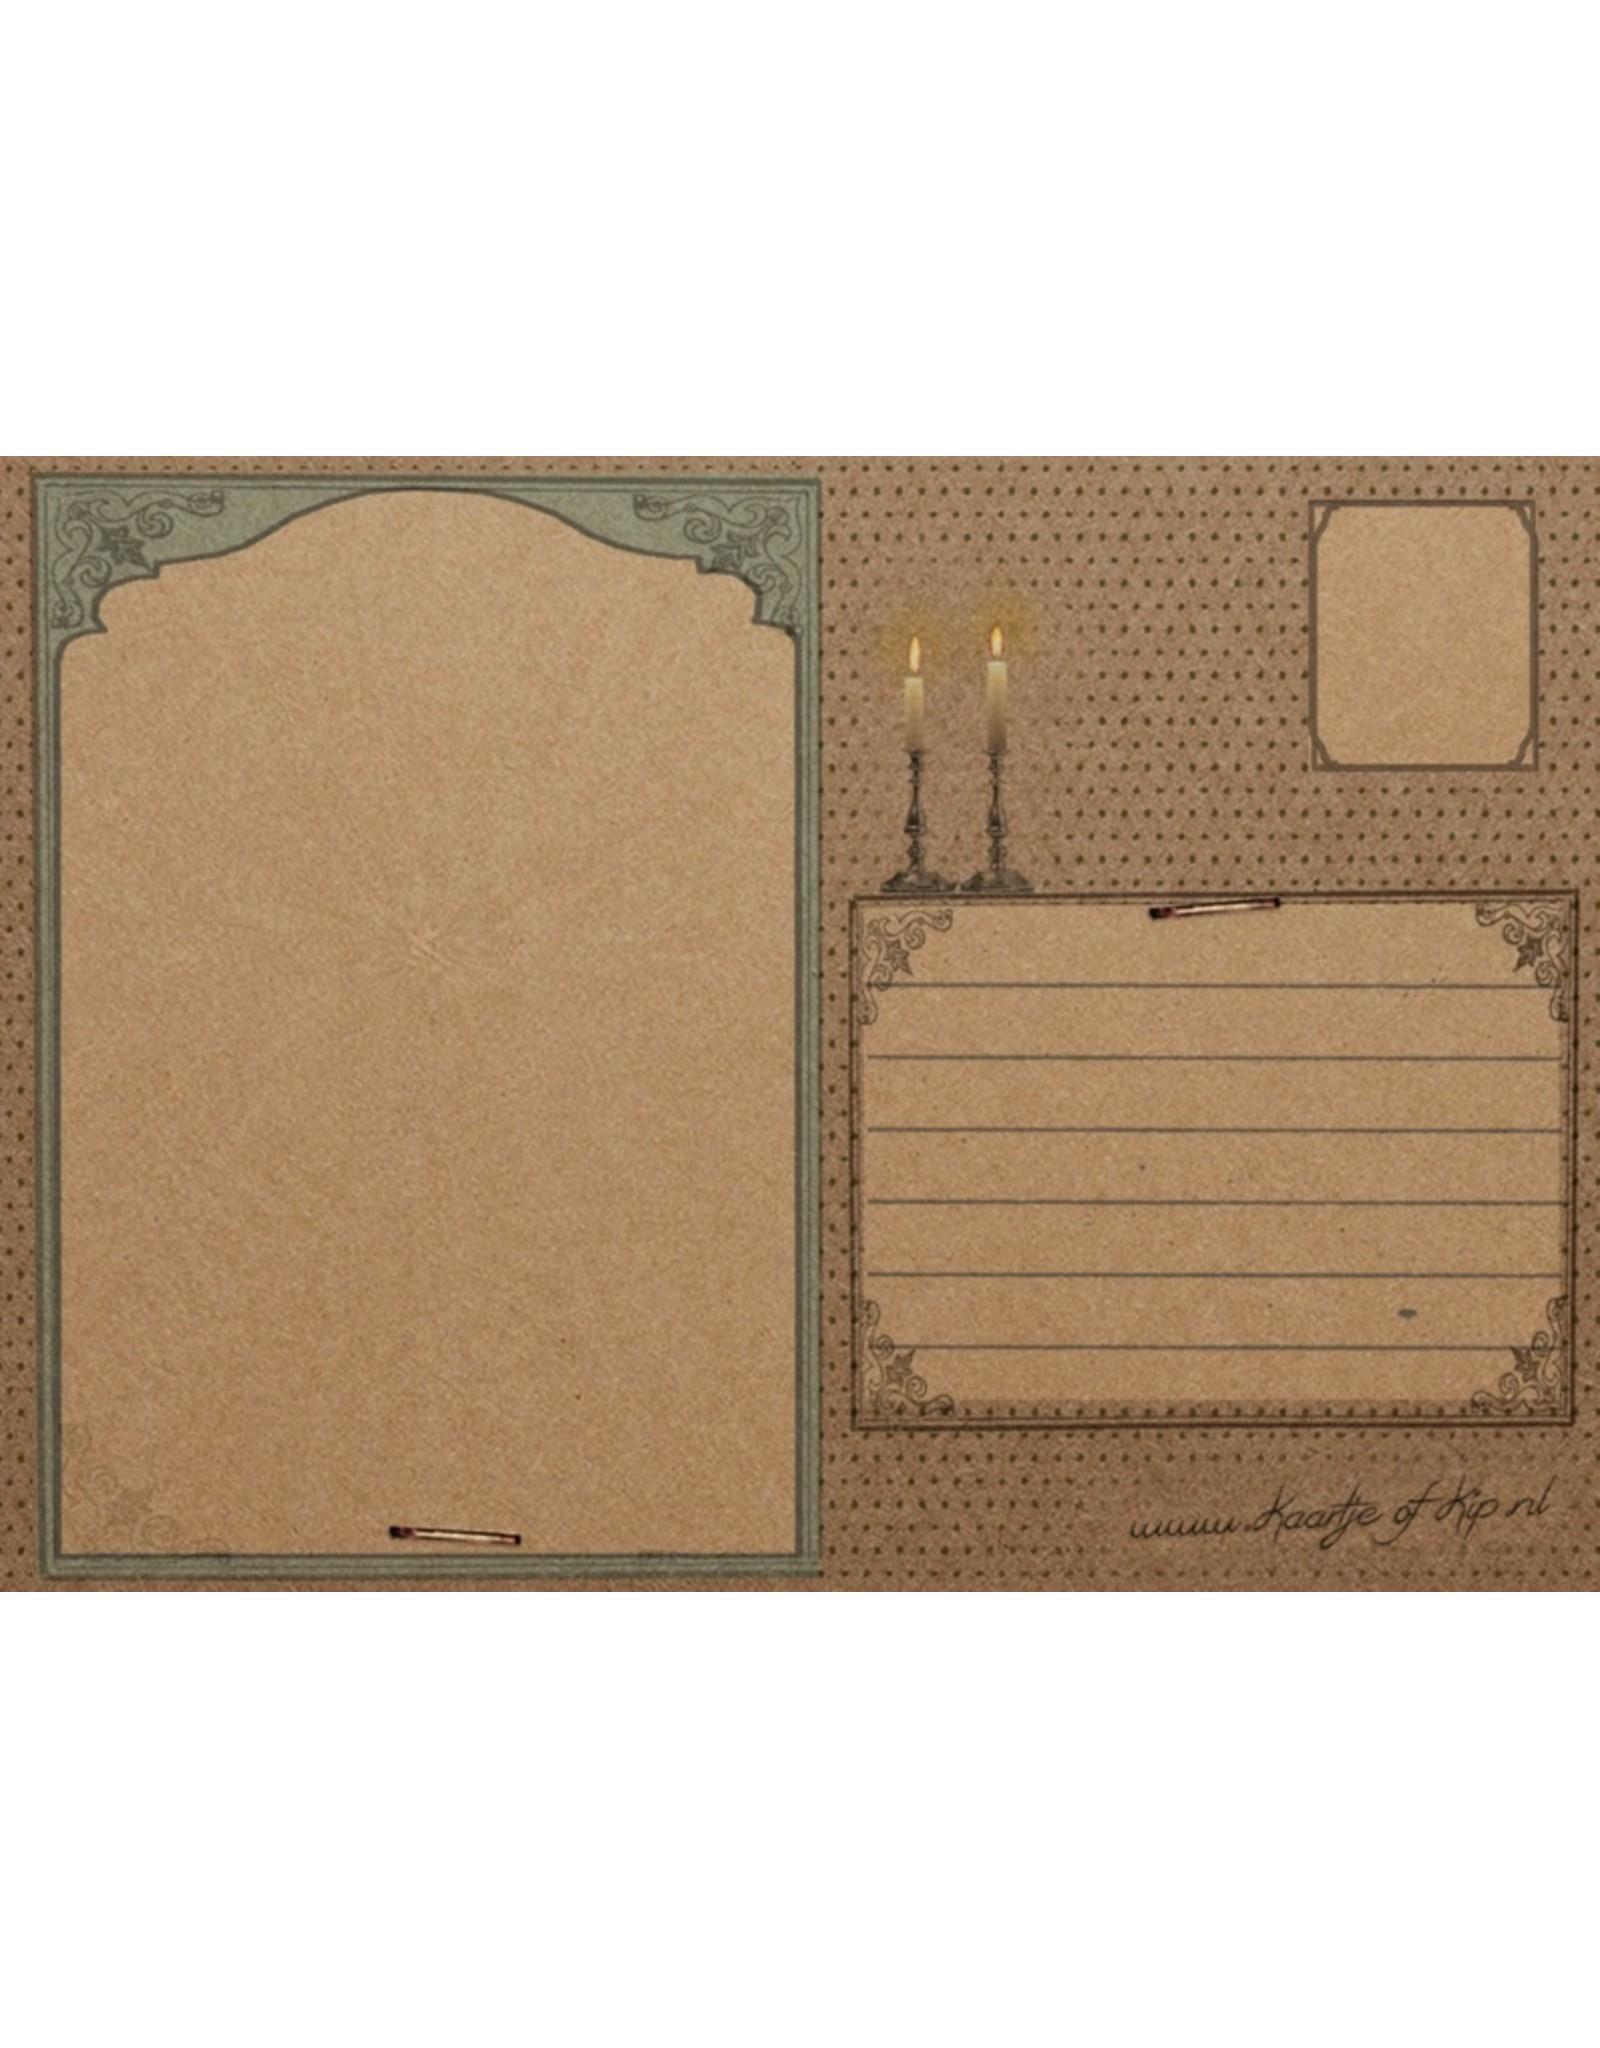 Postcard - date